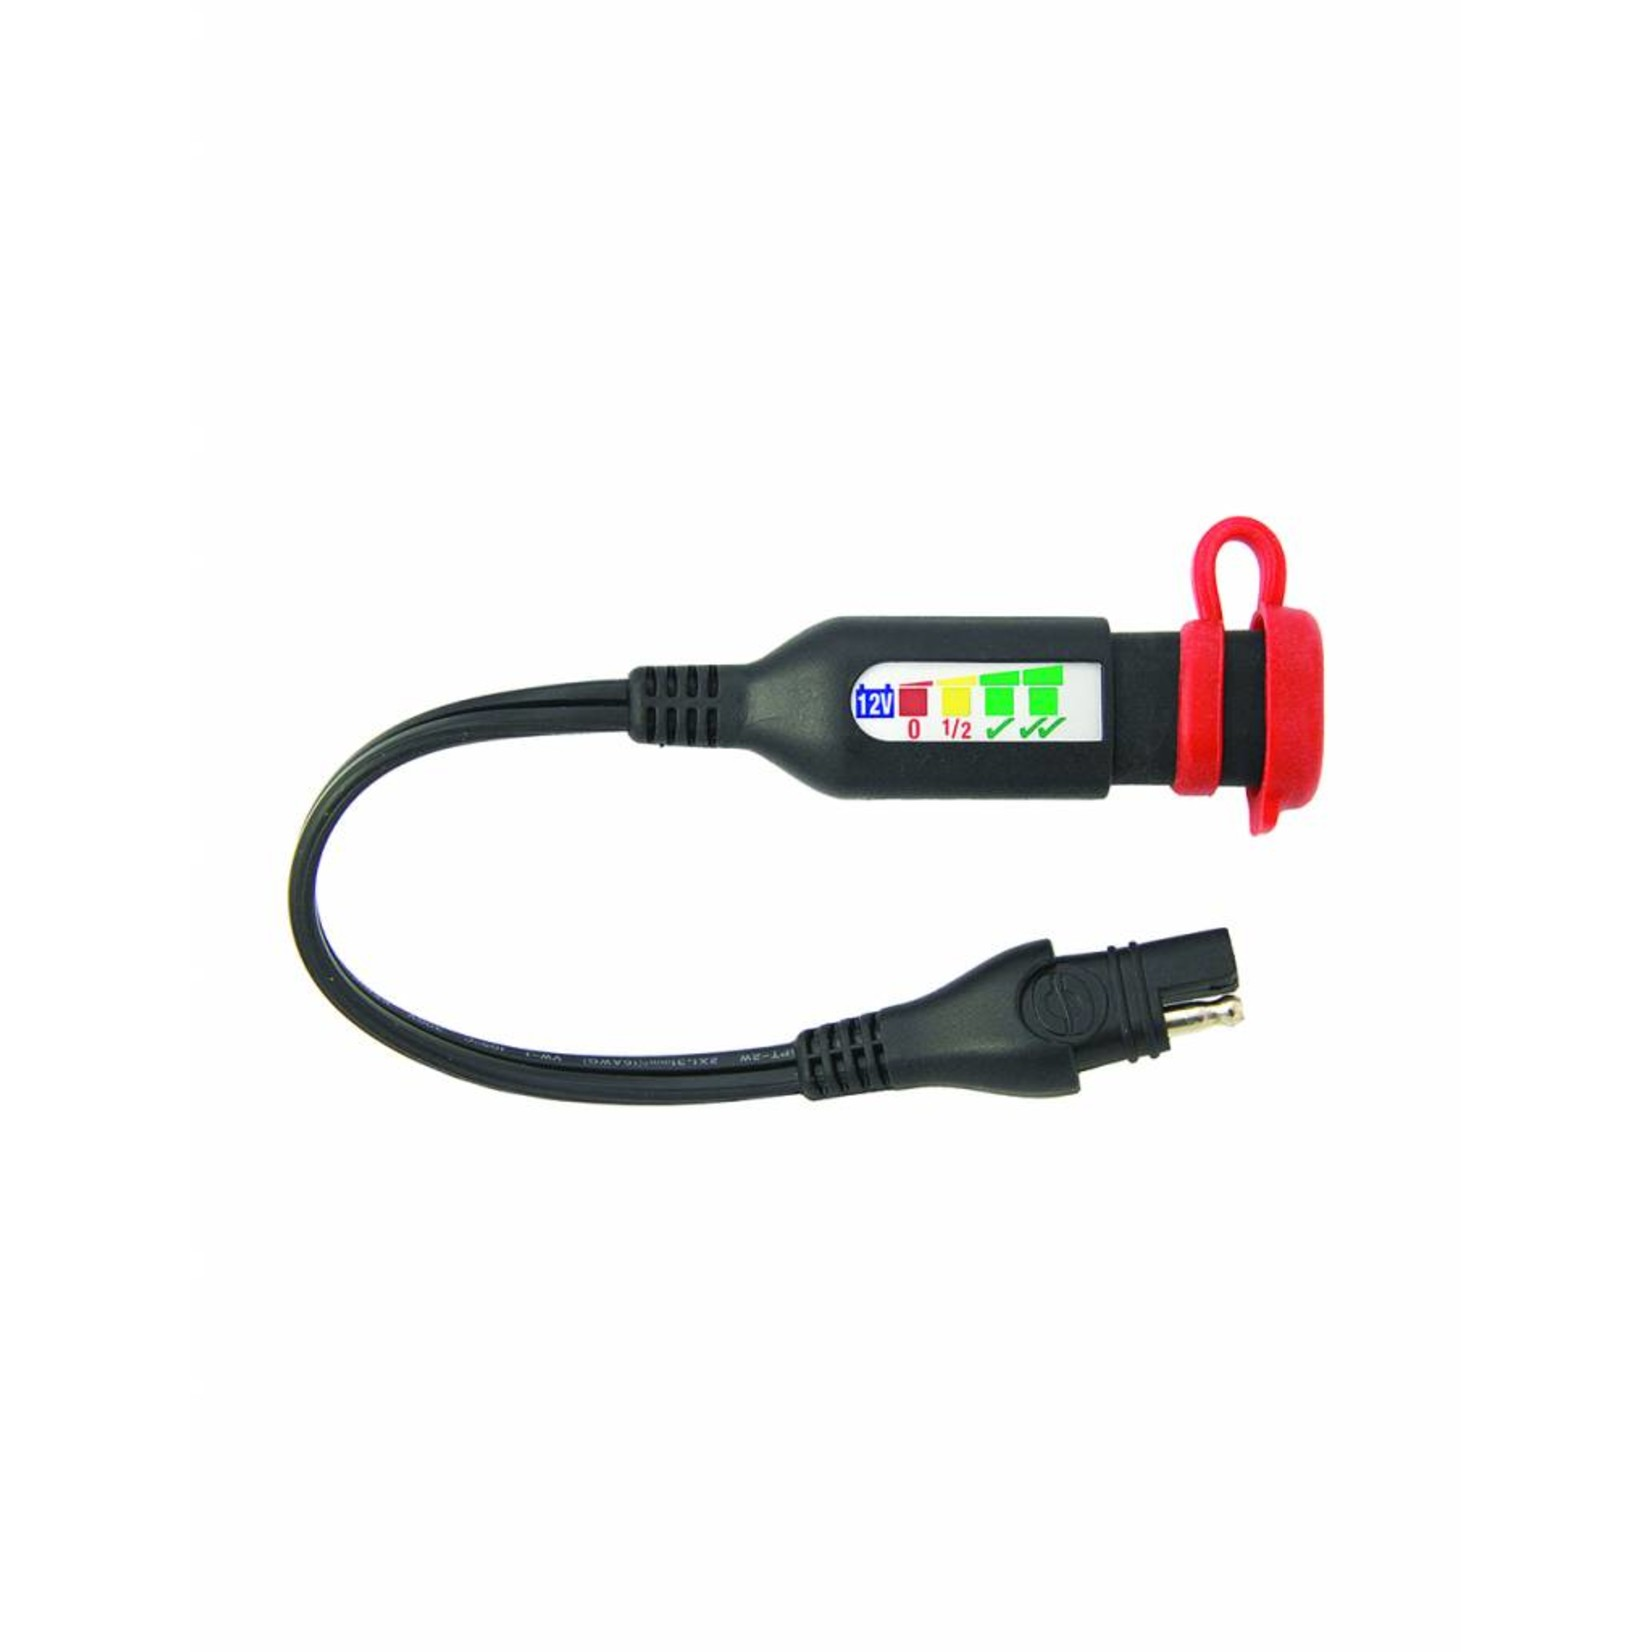 OptiMate OptiMate O-125 Battery monitor 12V